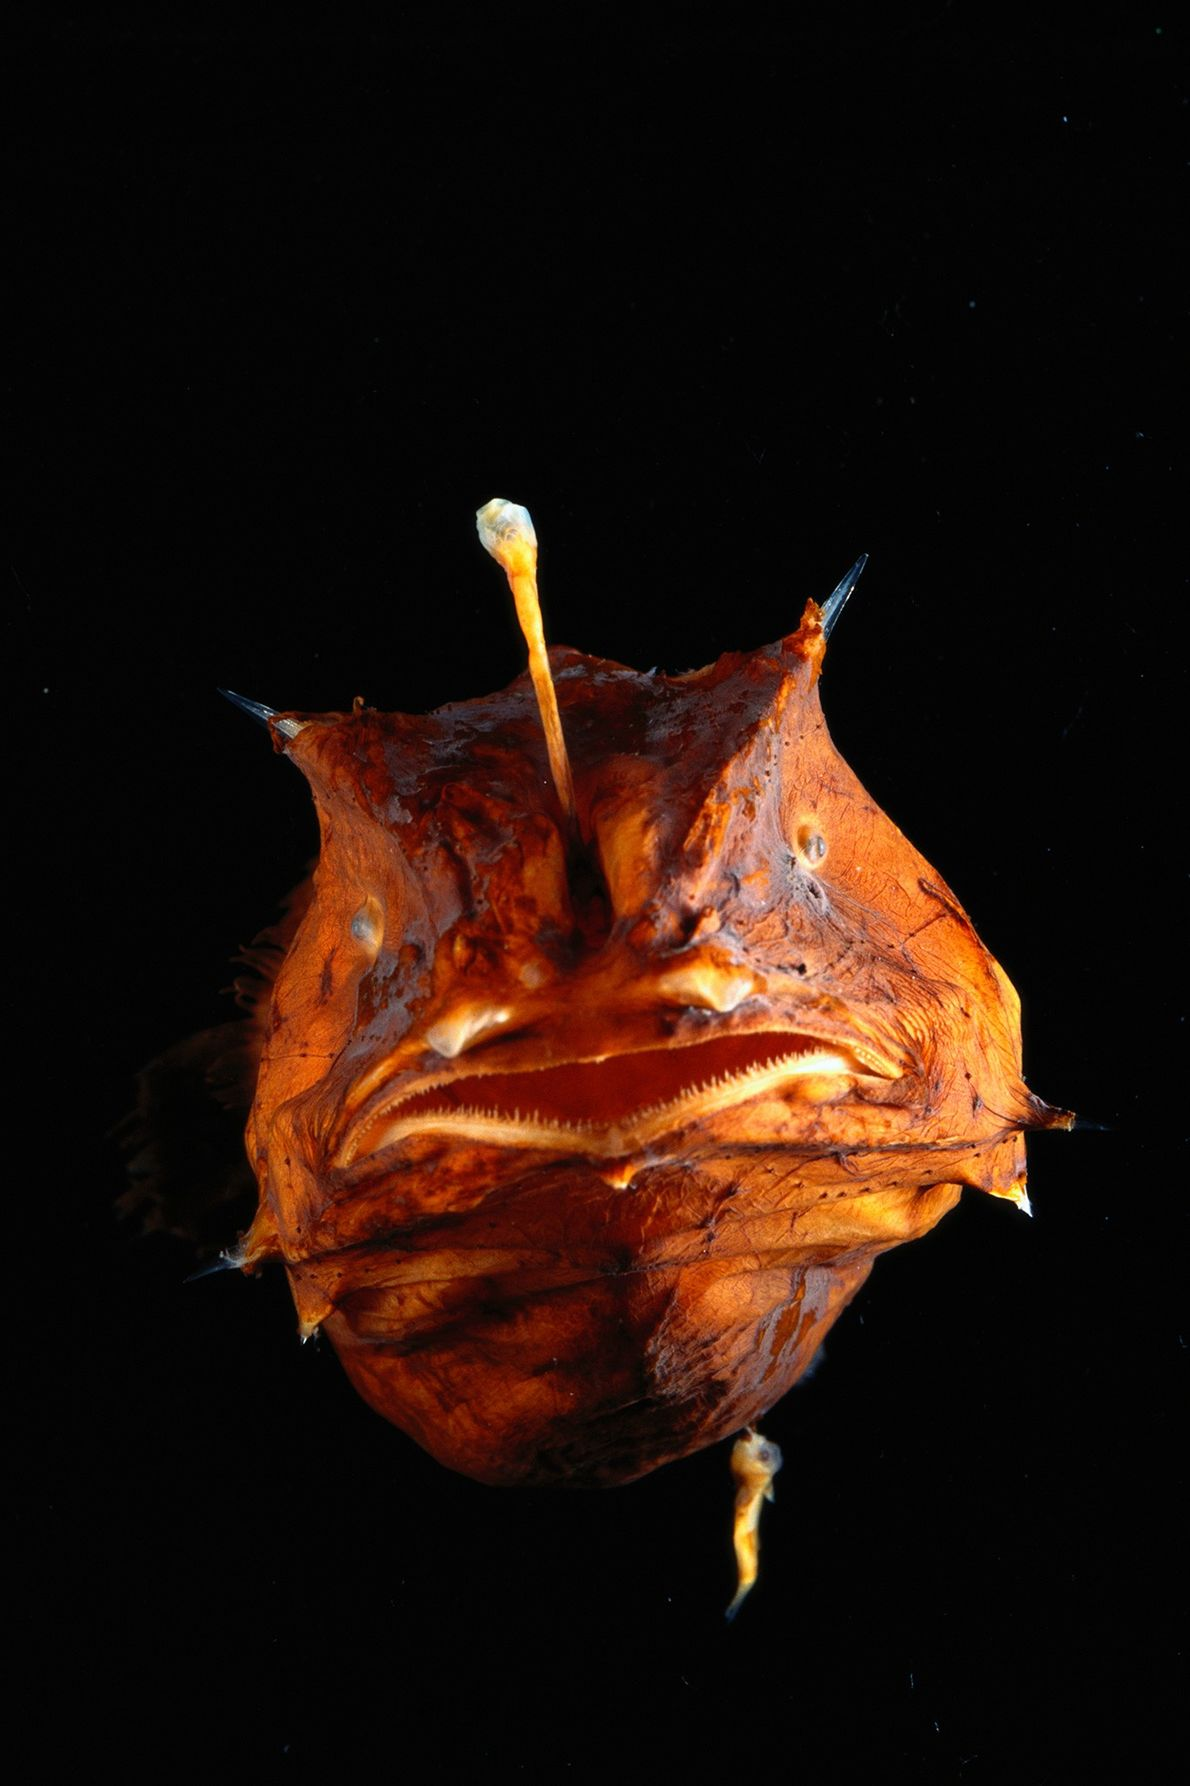 Lophiiformes